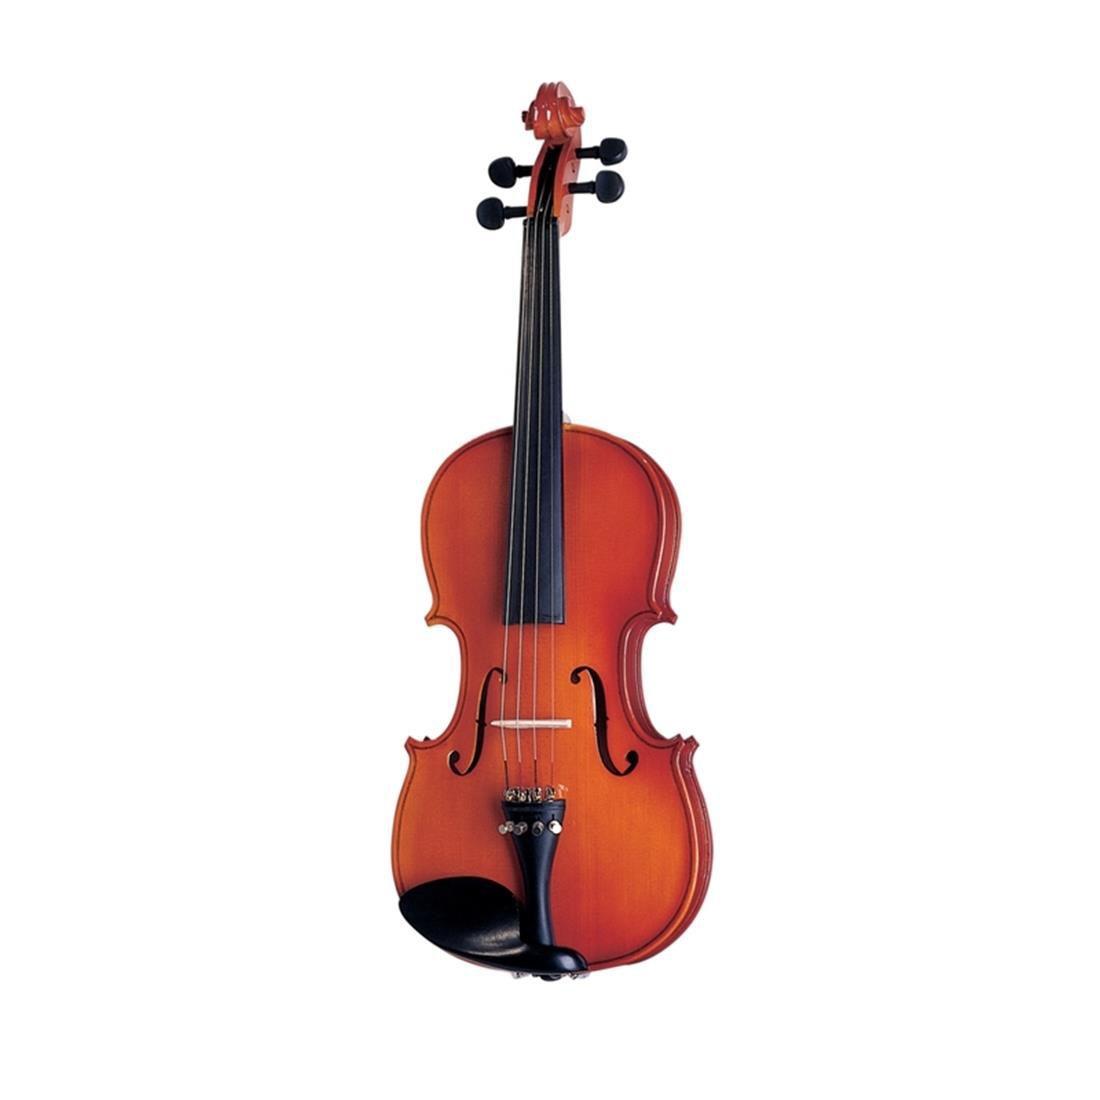 Violino 1/2 Michael Vnm11 Completo  - Luggi Instrumentos Musicais